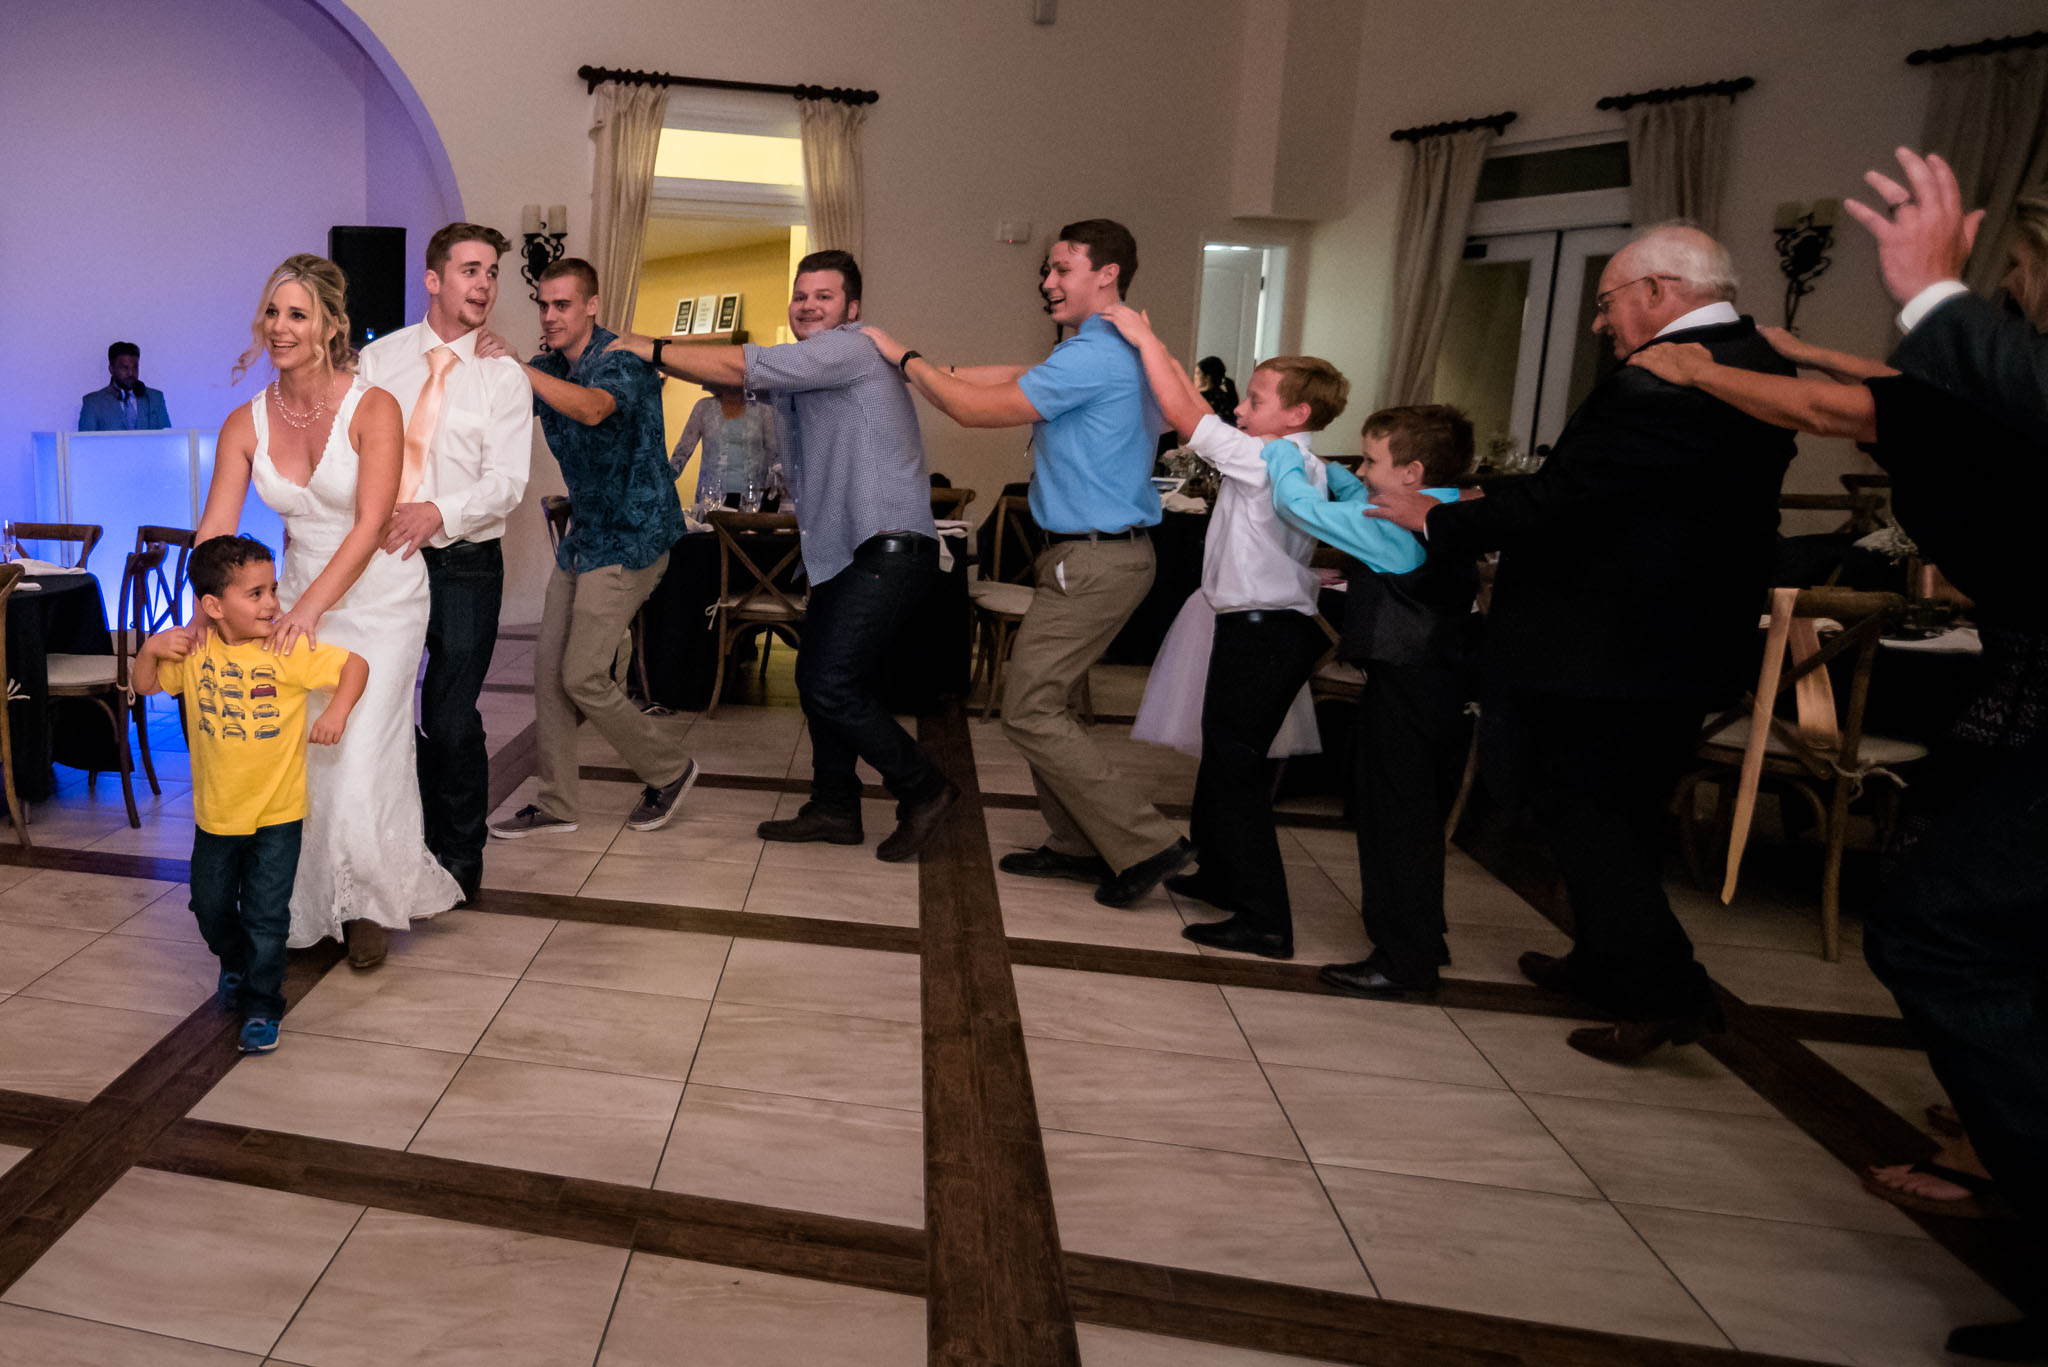 Avensole-Winery-Temecula-Wedding-Josh-and-Olivia-4292.JPG